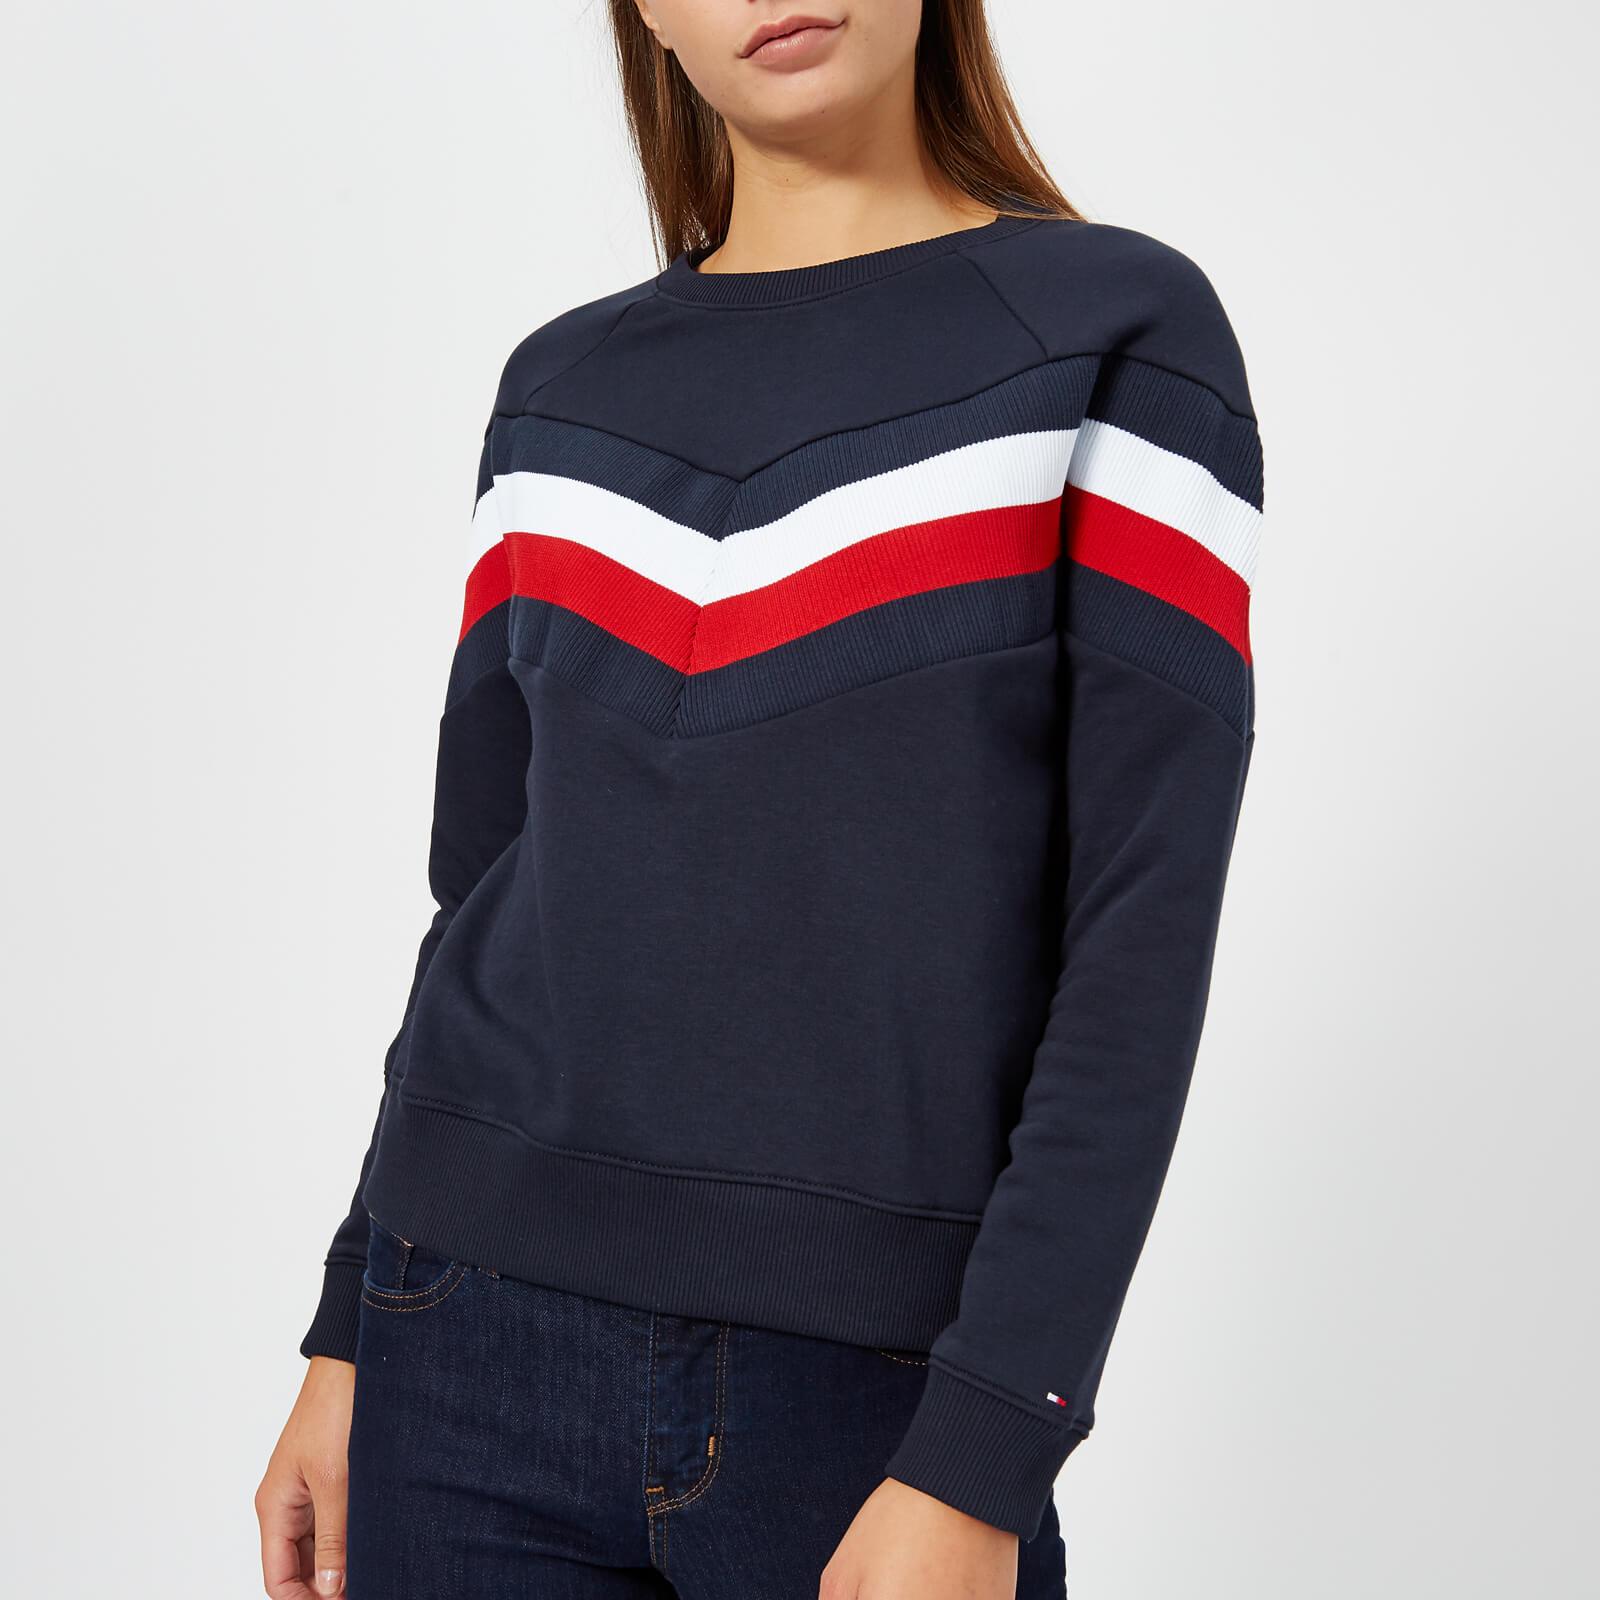 84620c3698479 Tommy Hilfiger Women s Faith Crew Neck Sweatshirt - Navy Womens Clothing